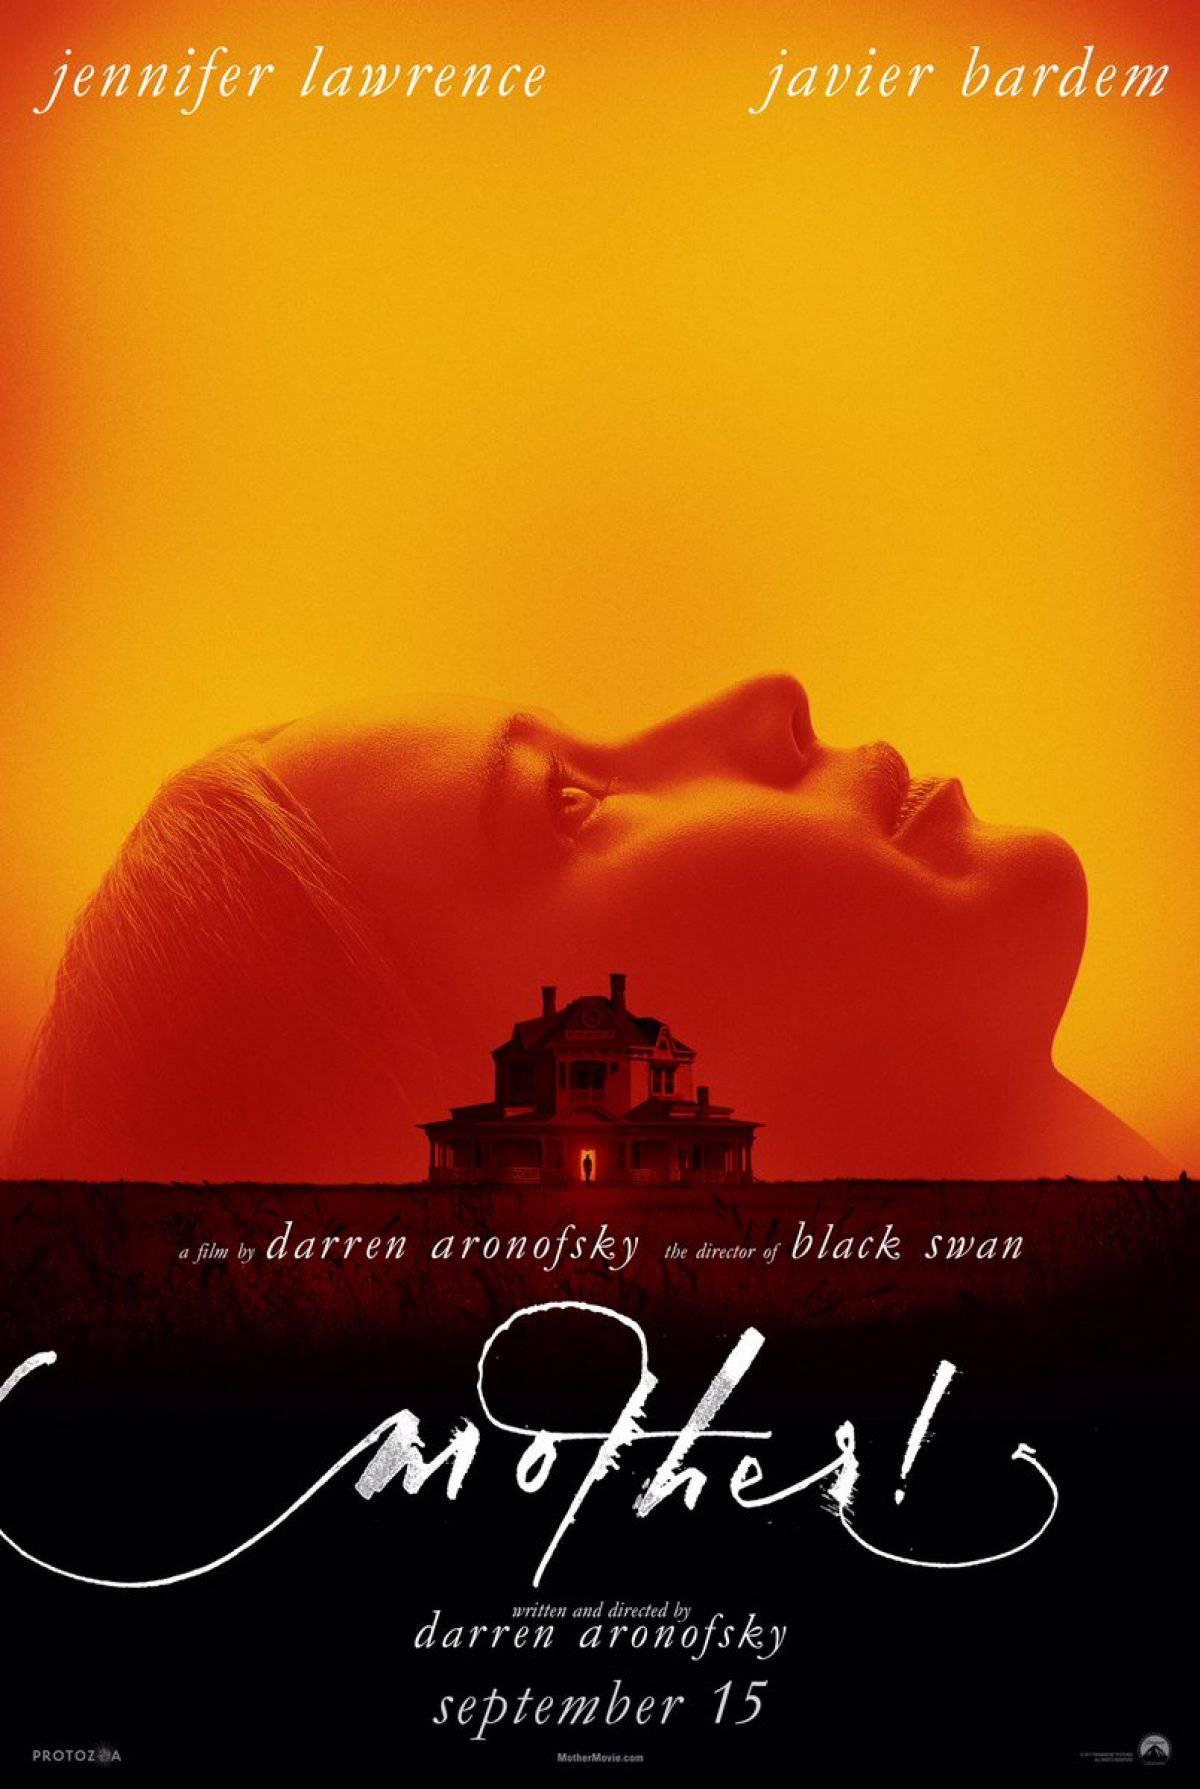 پوستر فیلم مادر! دارن آرونوفسکی